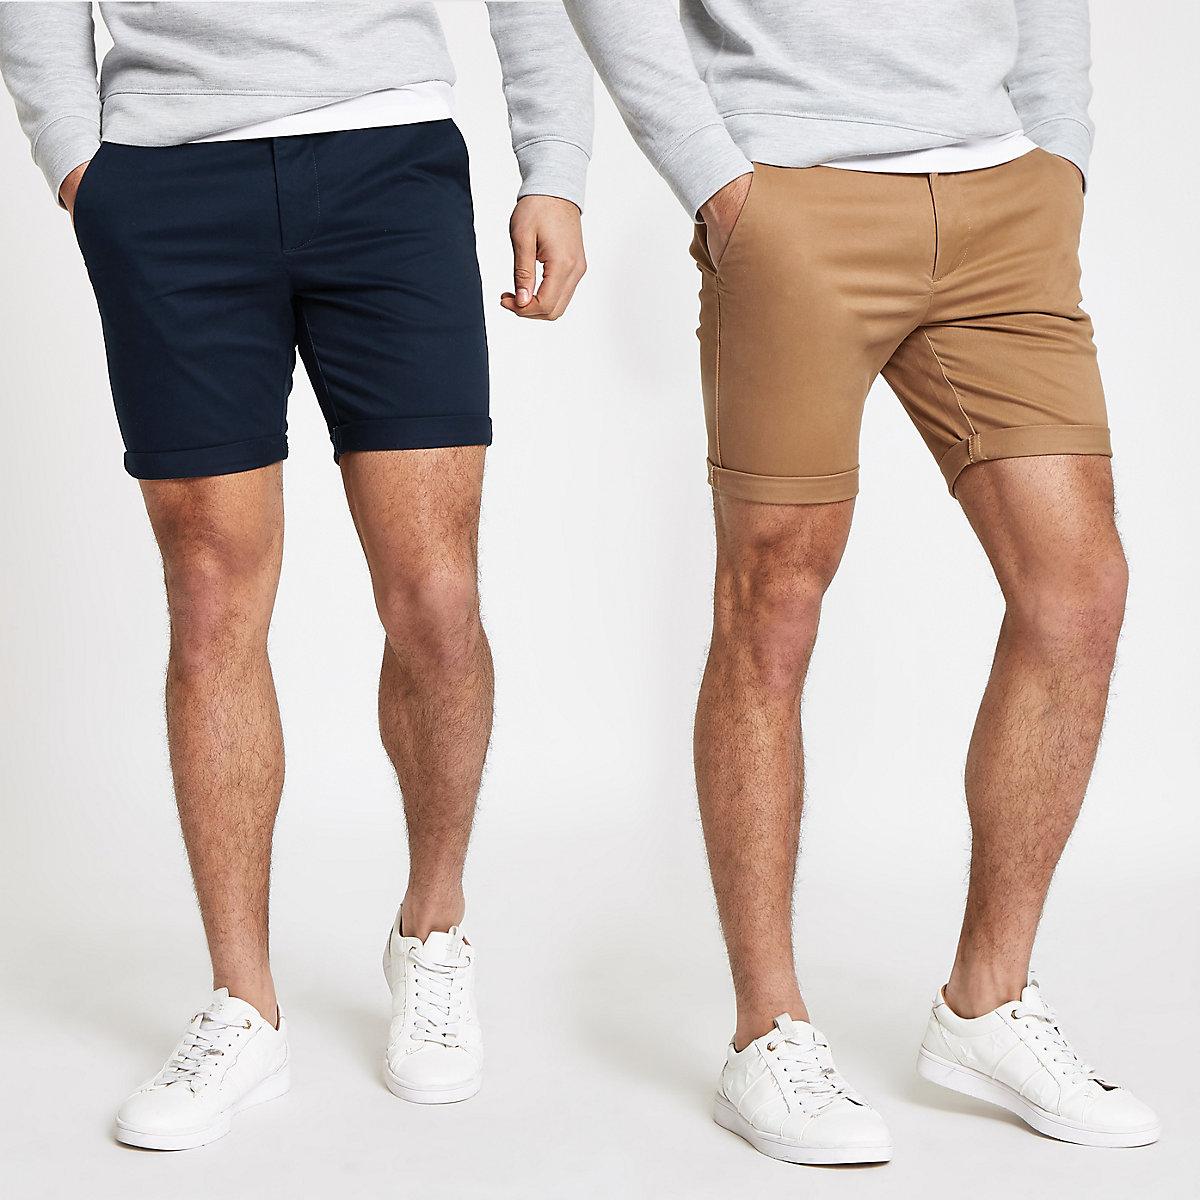 Lot de 2 shorts chino skinny bleu marine et marron